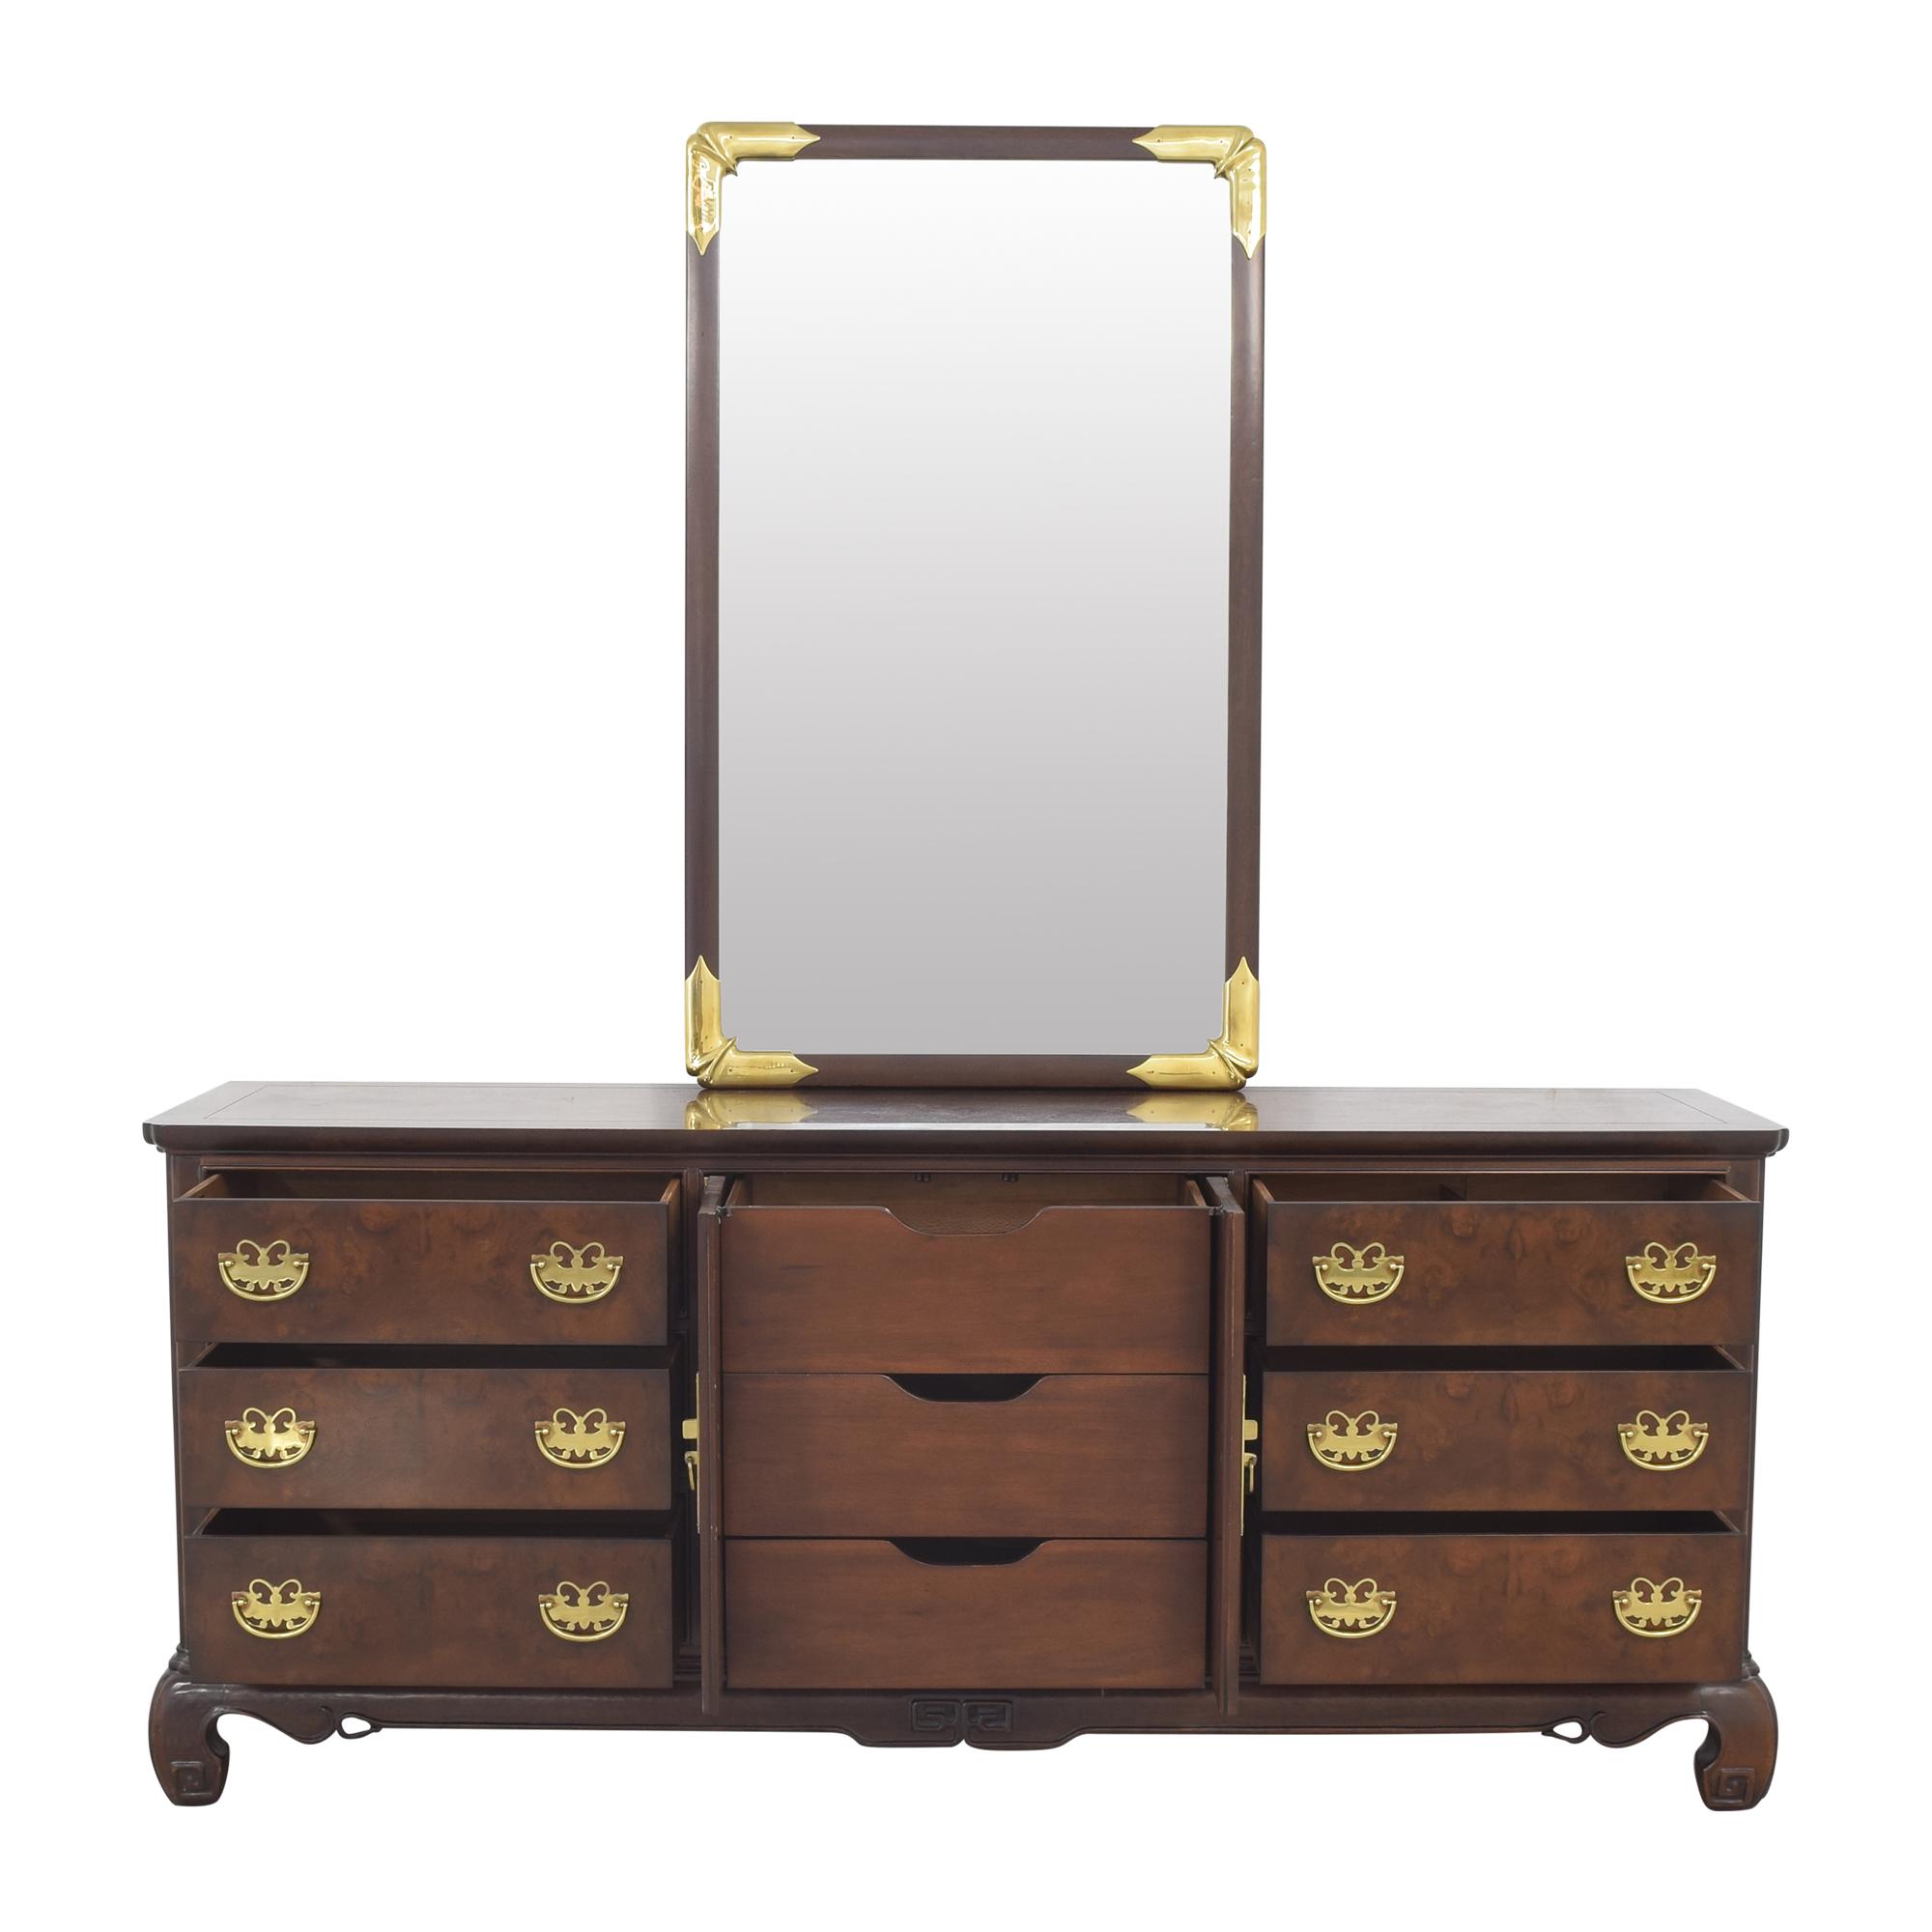 Heritage Henredon Heritage Henredon Dresser with Mirror ct